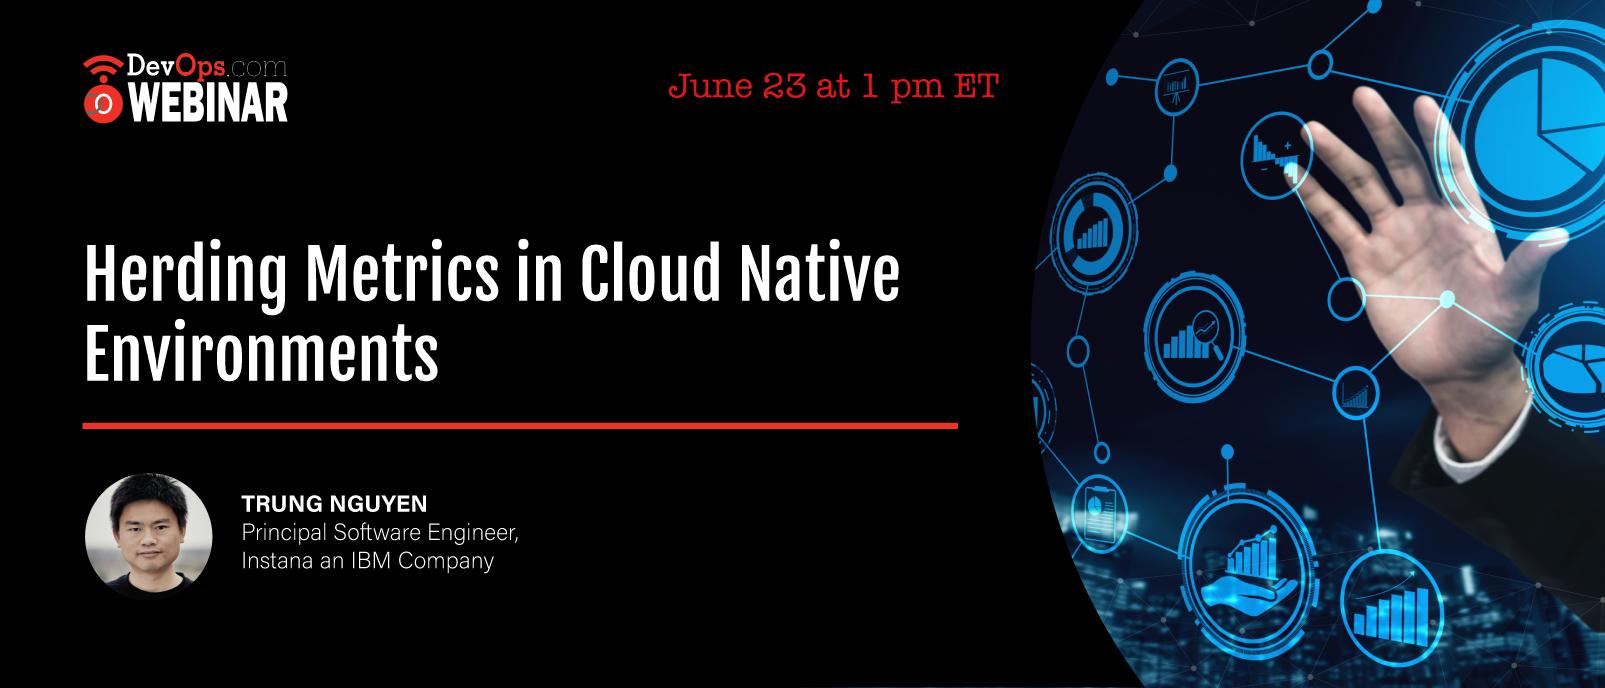 Herding Metrics in Cloud Native Environments